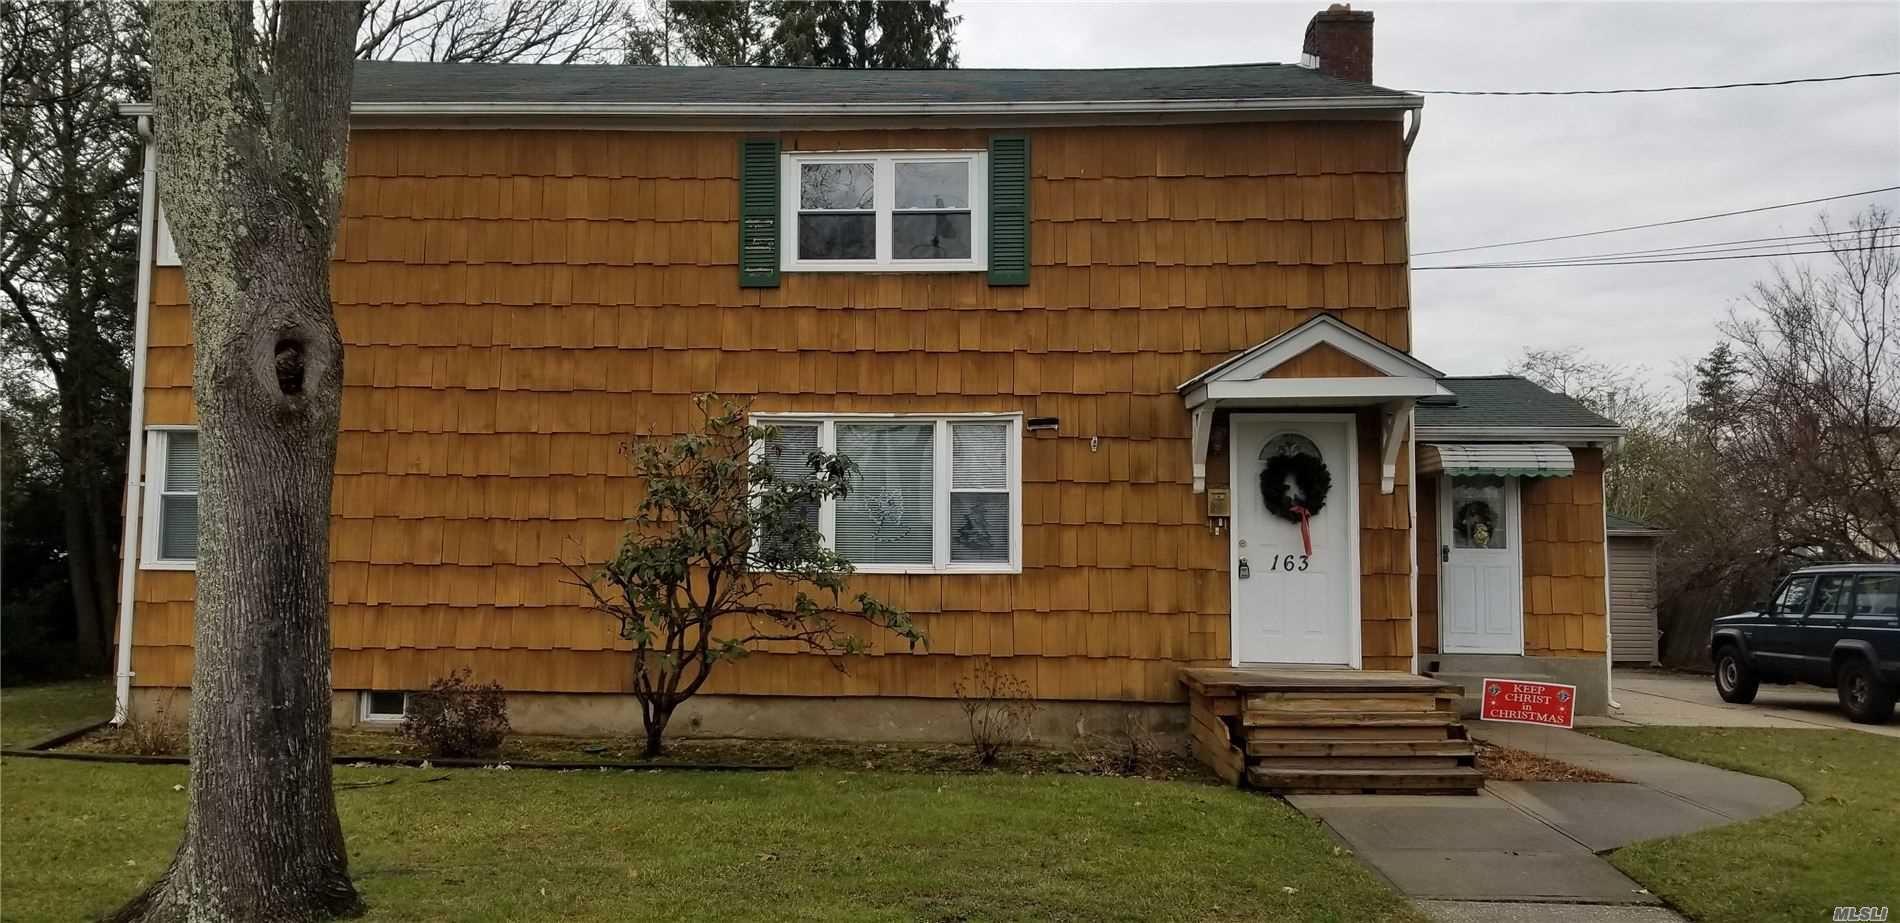 163 New Hampshire S #2 fl, Massapequa, NY 11758 - MLS#: 3242167